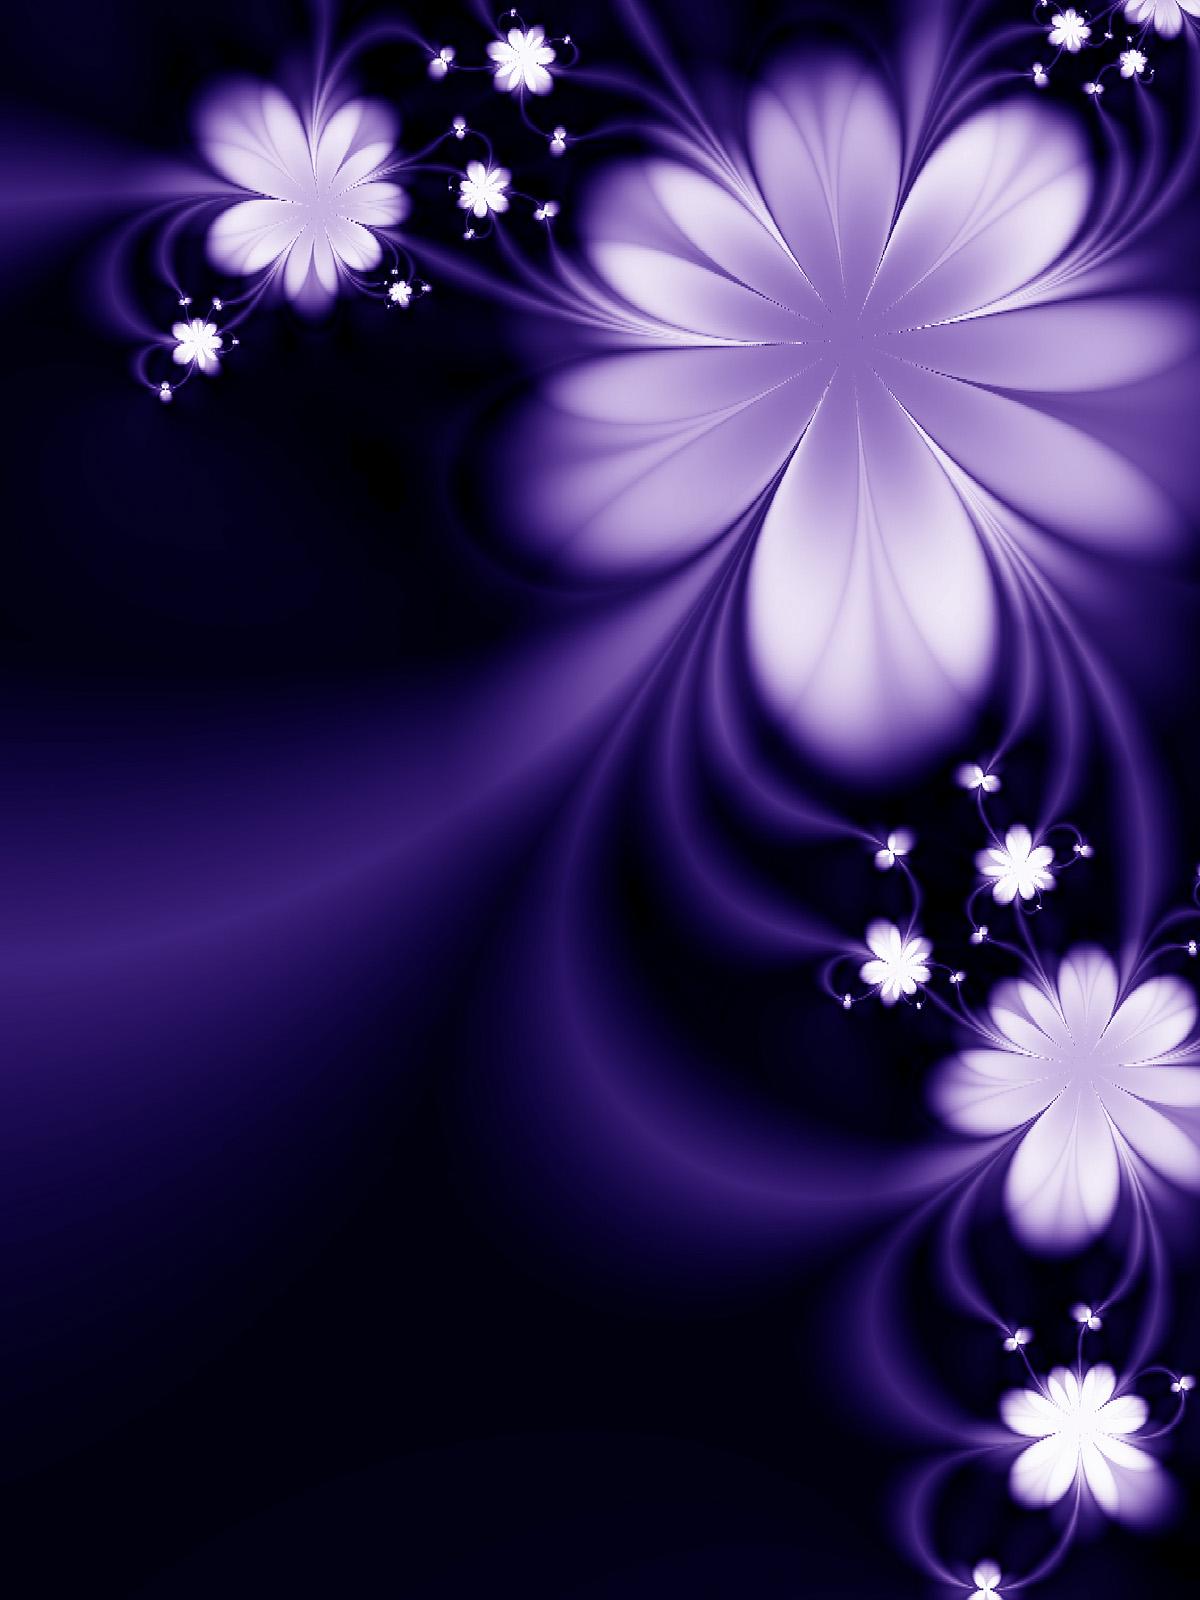 17 Beautiful Background Designs Images - Pretty Swirl ...